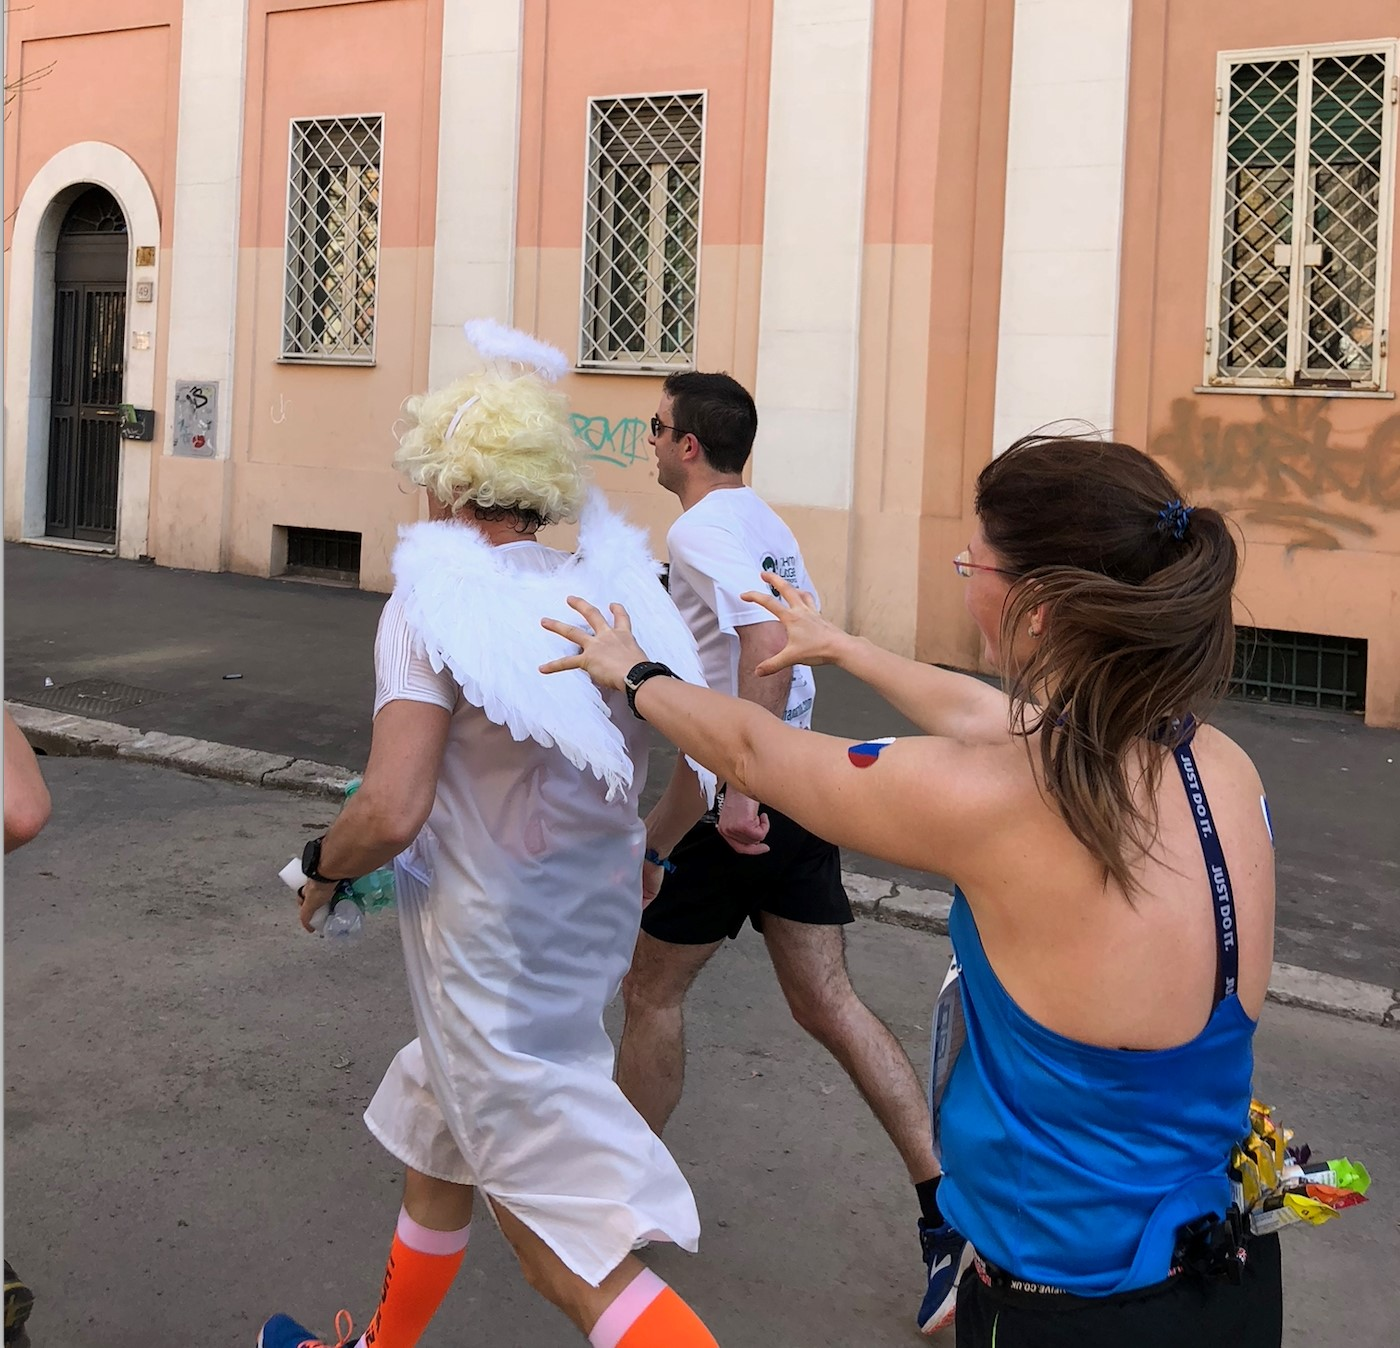 [Хабра-оффтоп] Maratona di Roma, или первый марафон для ИТ-шника - 19